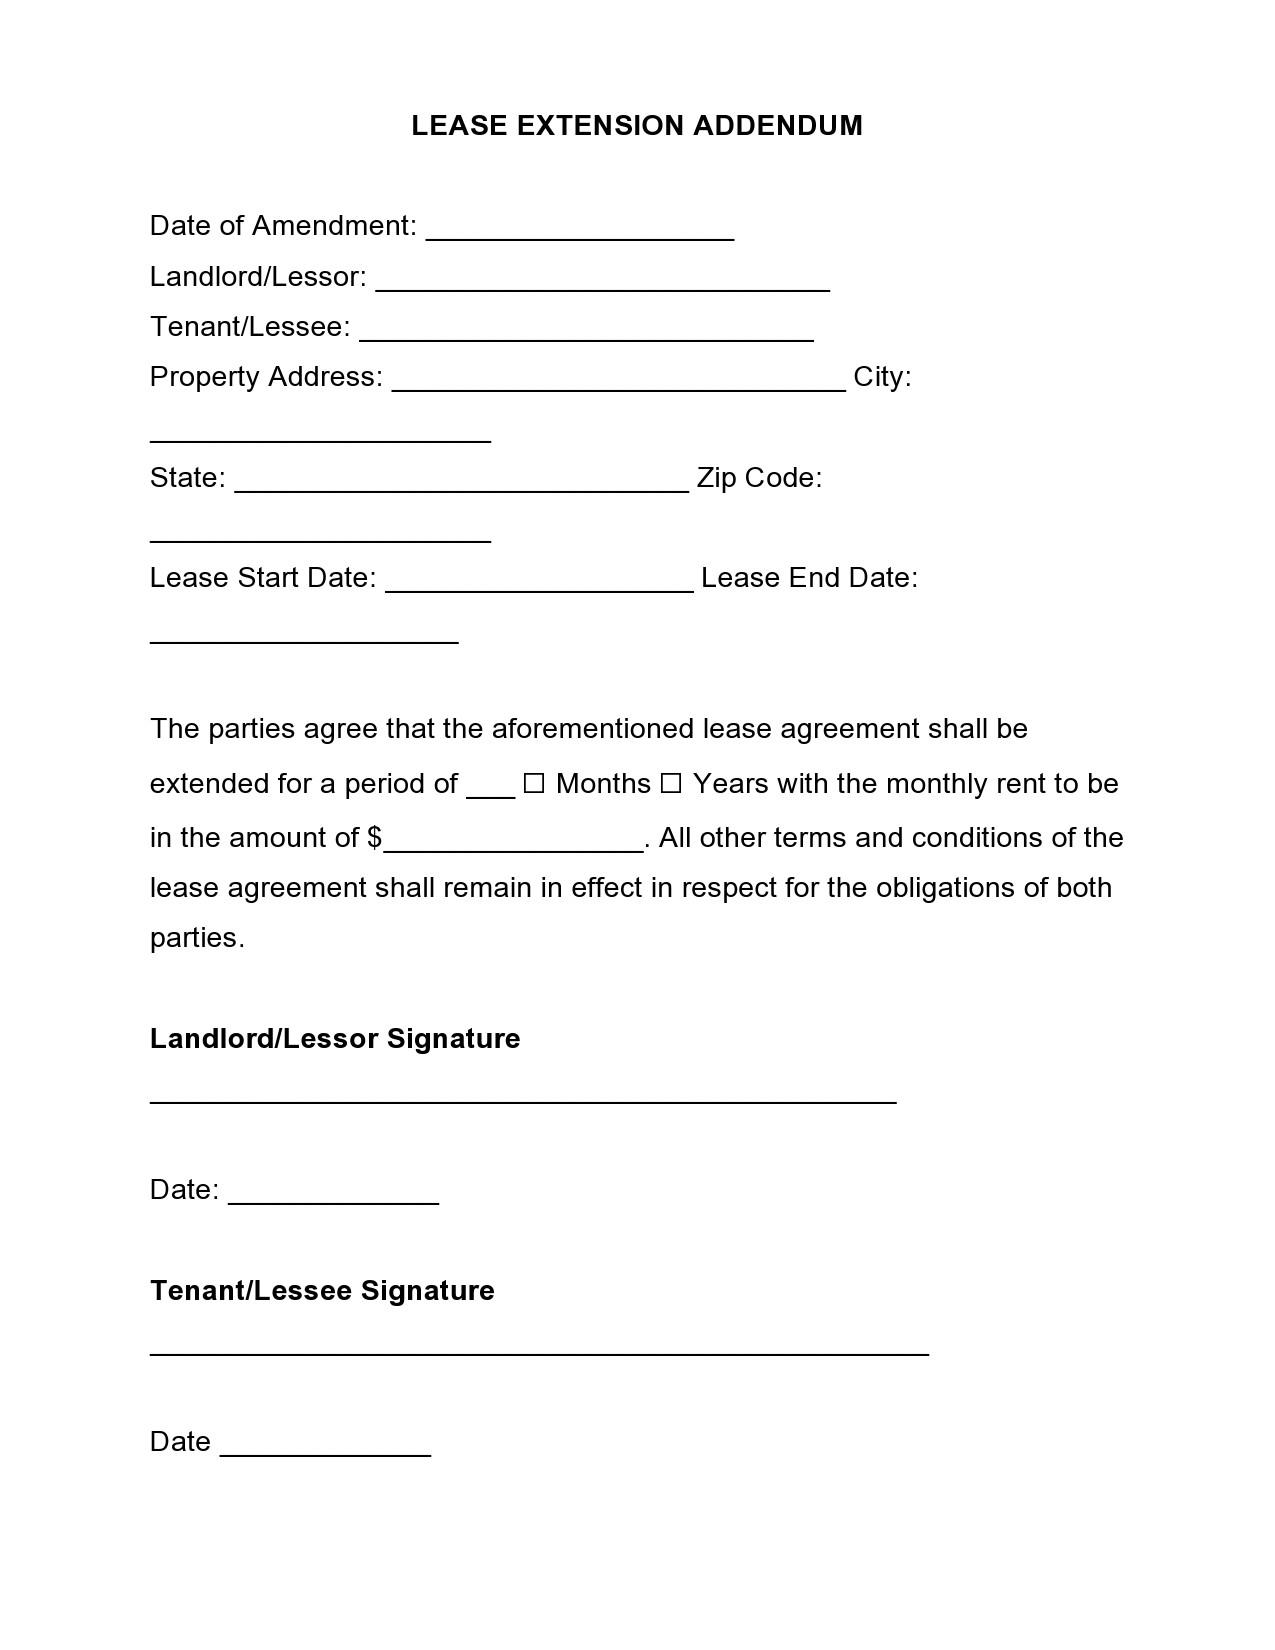 Free lease extension addendum 04